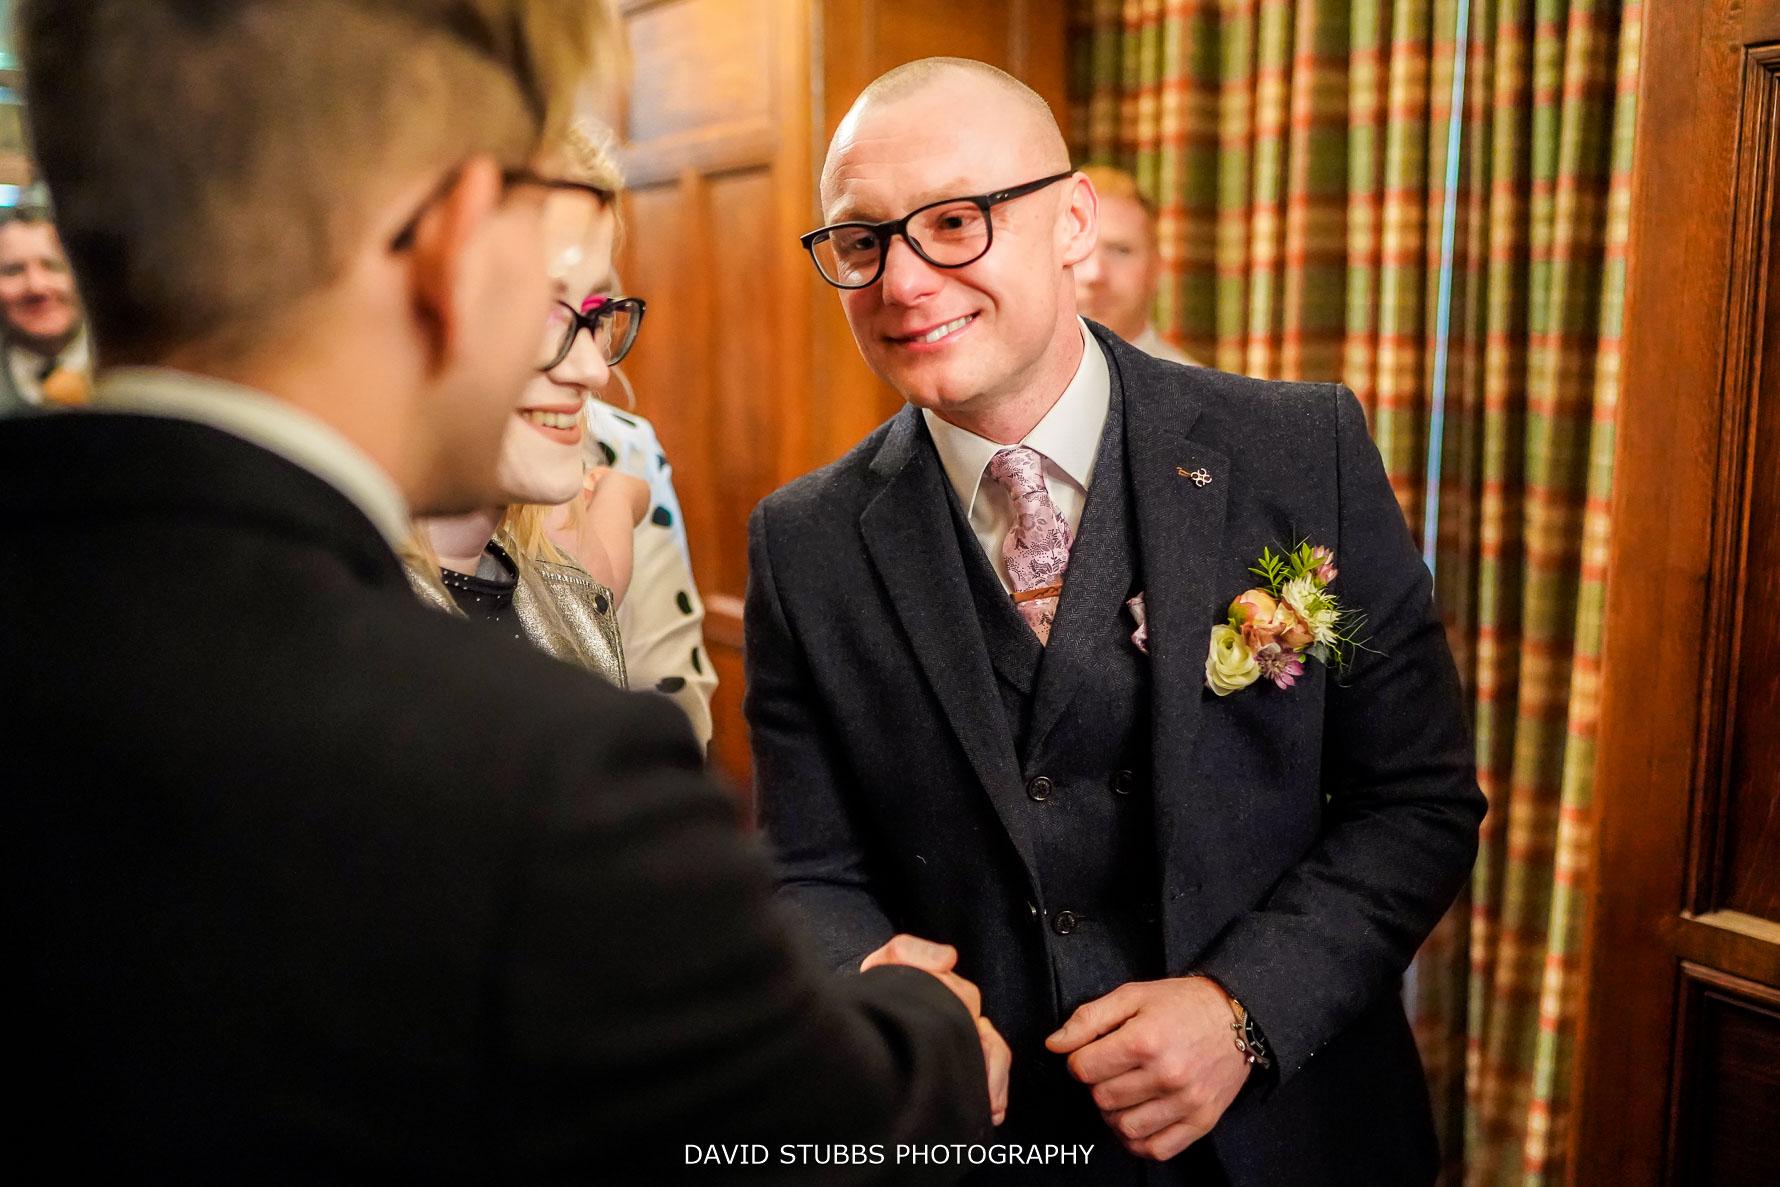 close up photo of wedding groom